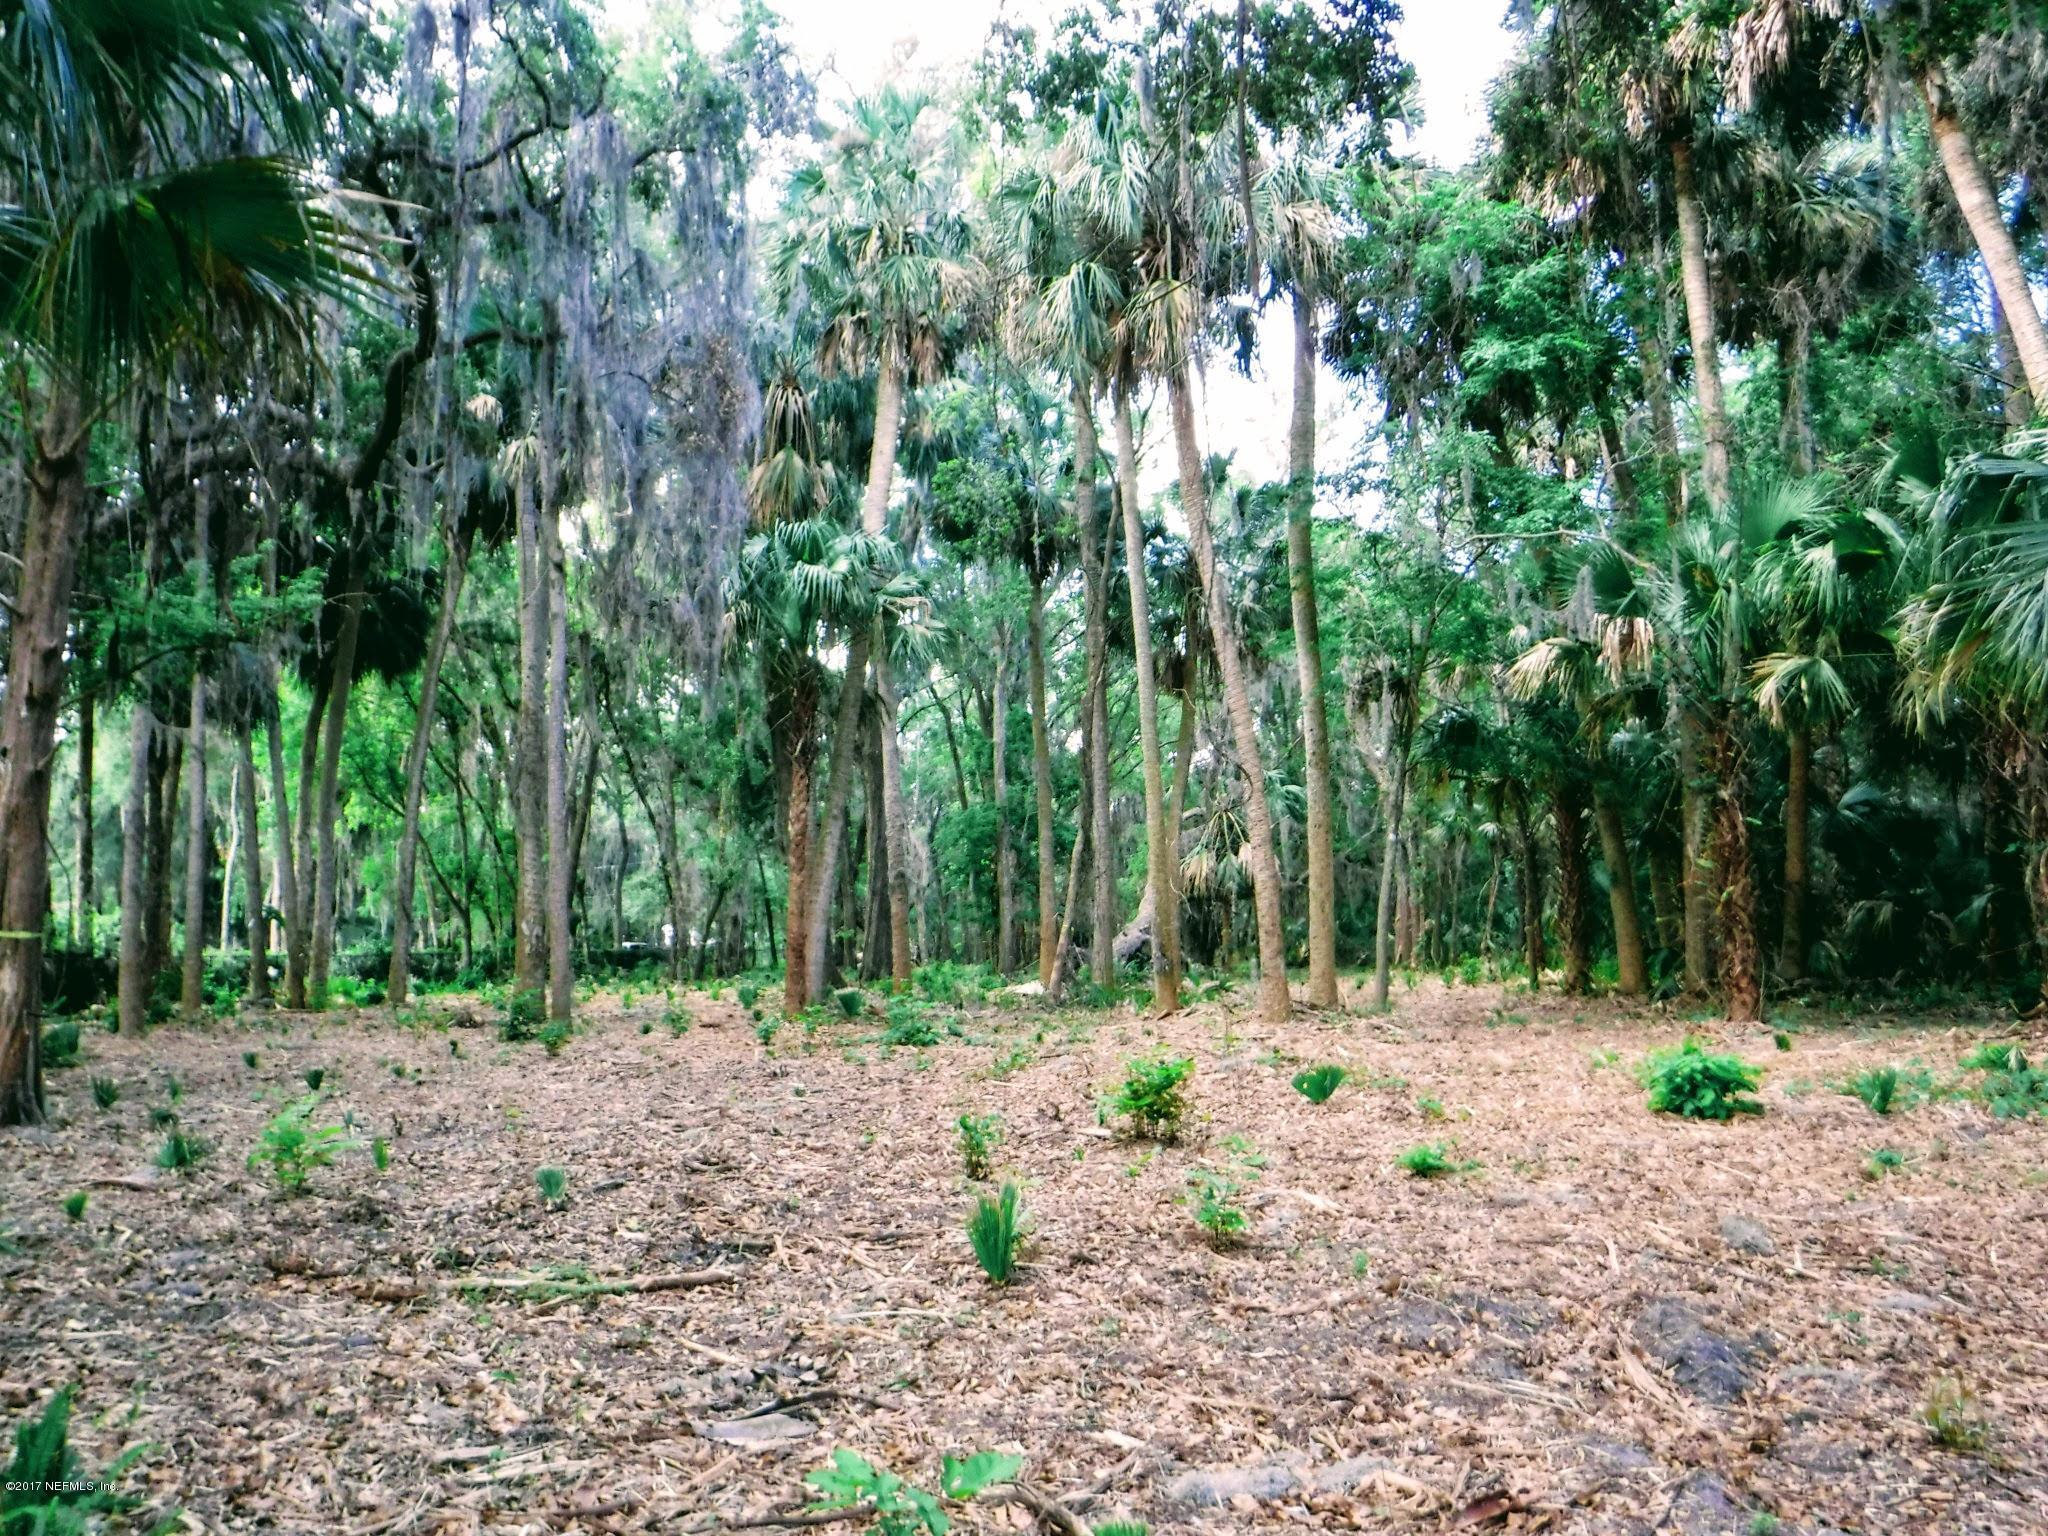 133 ORANGE TREE, EAST PALATKA, FLORIDA 32131, ,Vacant land,For sale,ORANGE TREE,873749